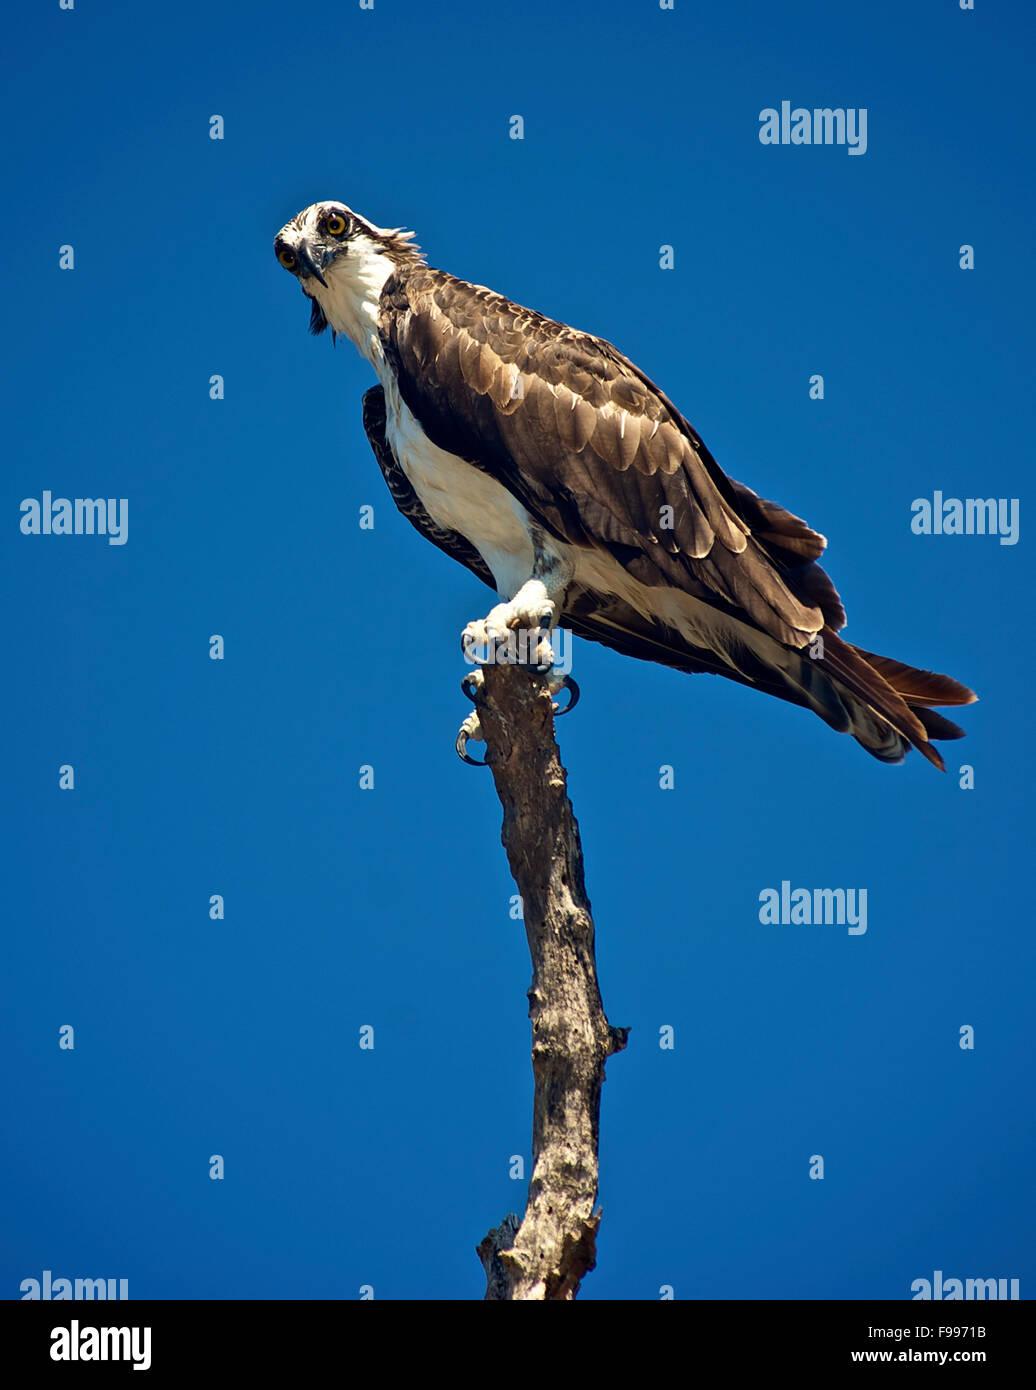 An osprey perches atop a tree branch in Florida. - Stock Image